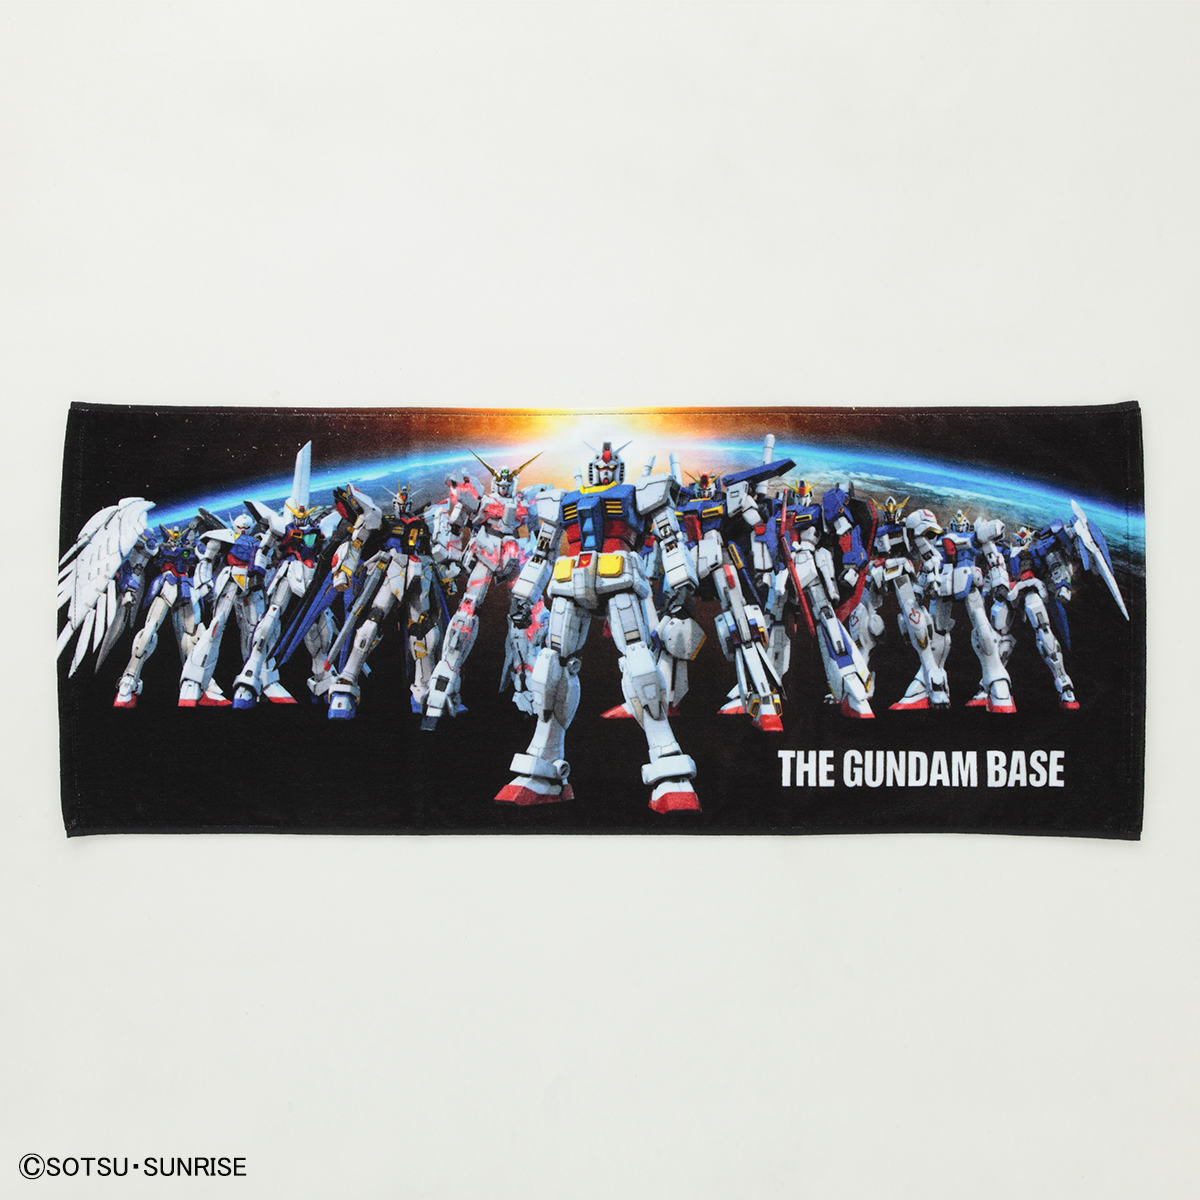 THE GUNDAM BASE フェイスタオル 商品画像